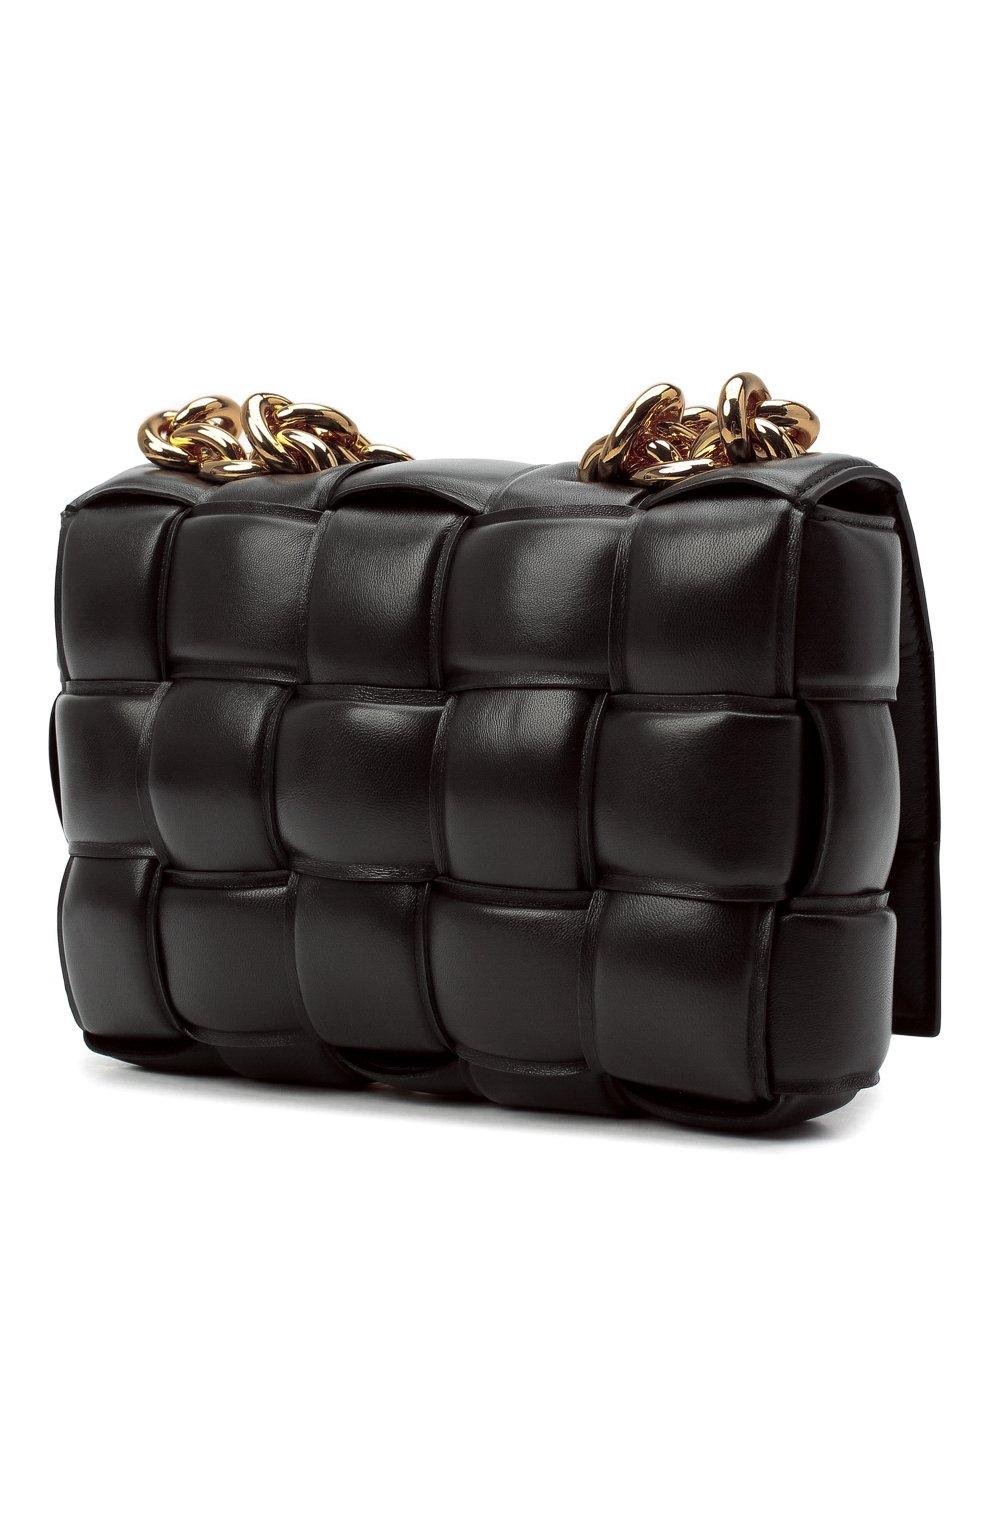 Женская сумка chain cassette BOTTEGA VENETA темно-коричневого цвета, арт. 631421/VBWZ0 | Фото 4